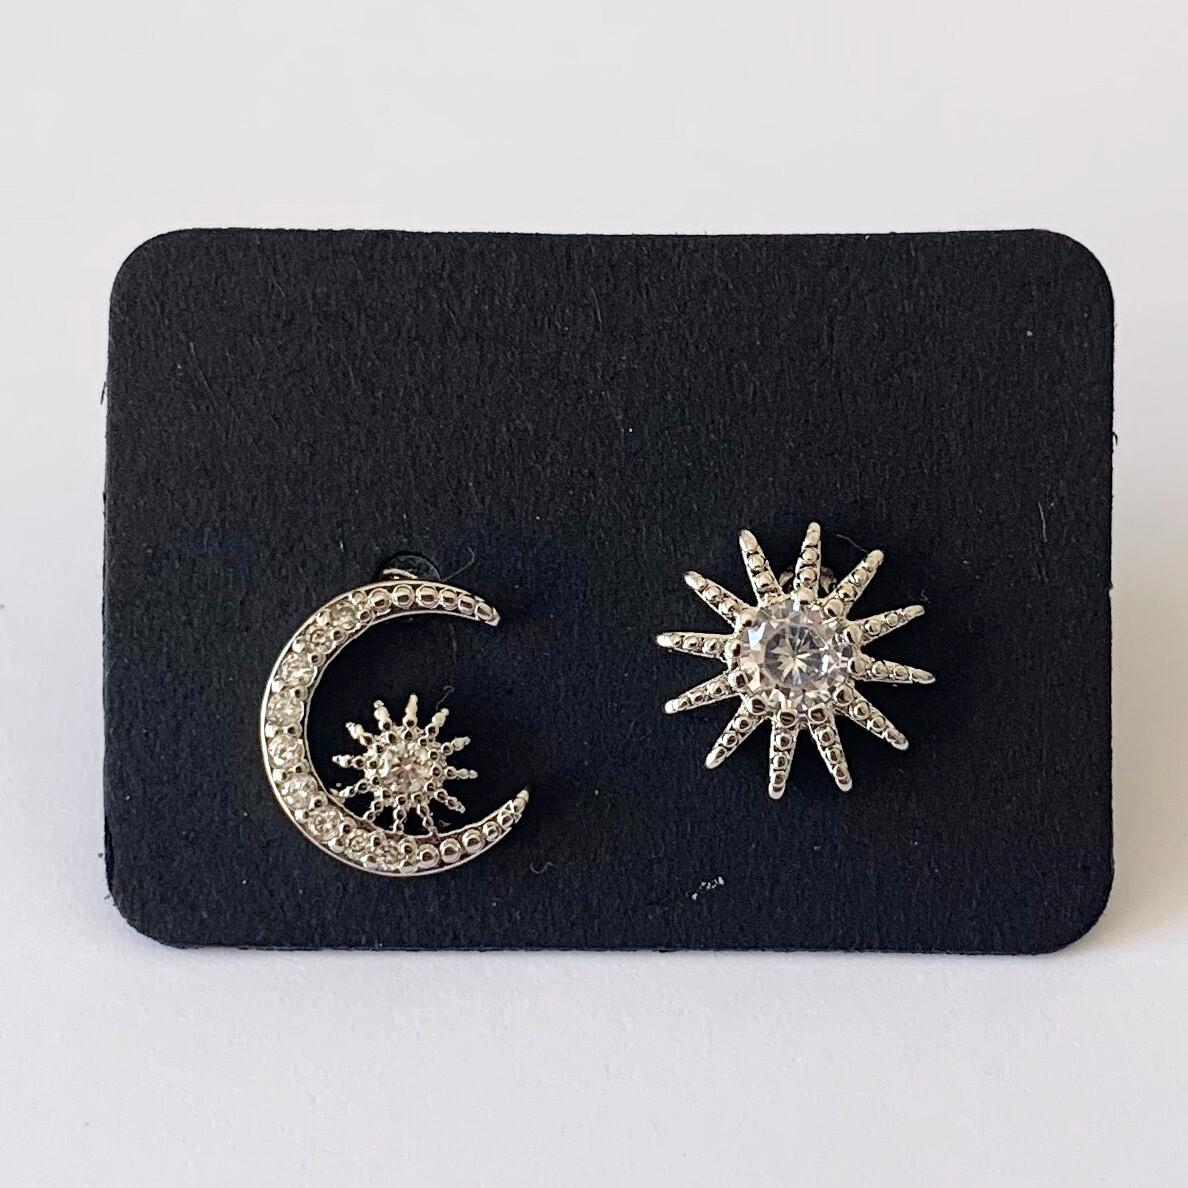 Ster en maan knopjes met strass steentjes 925 sterling zilver